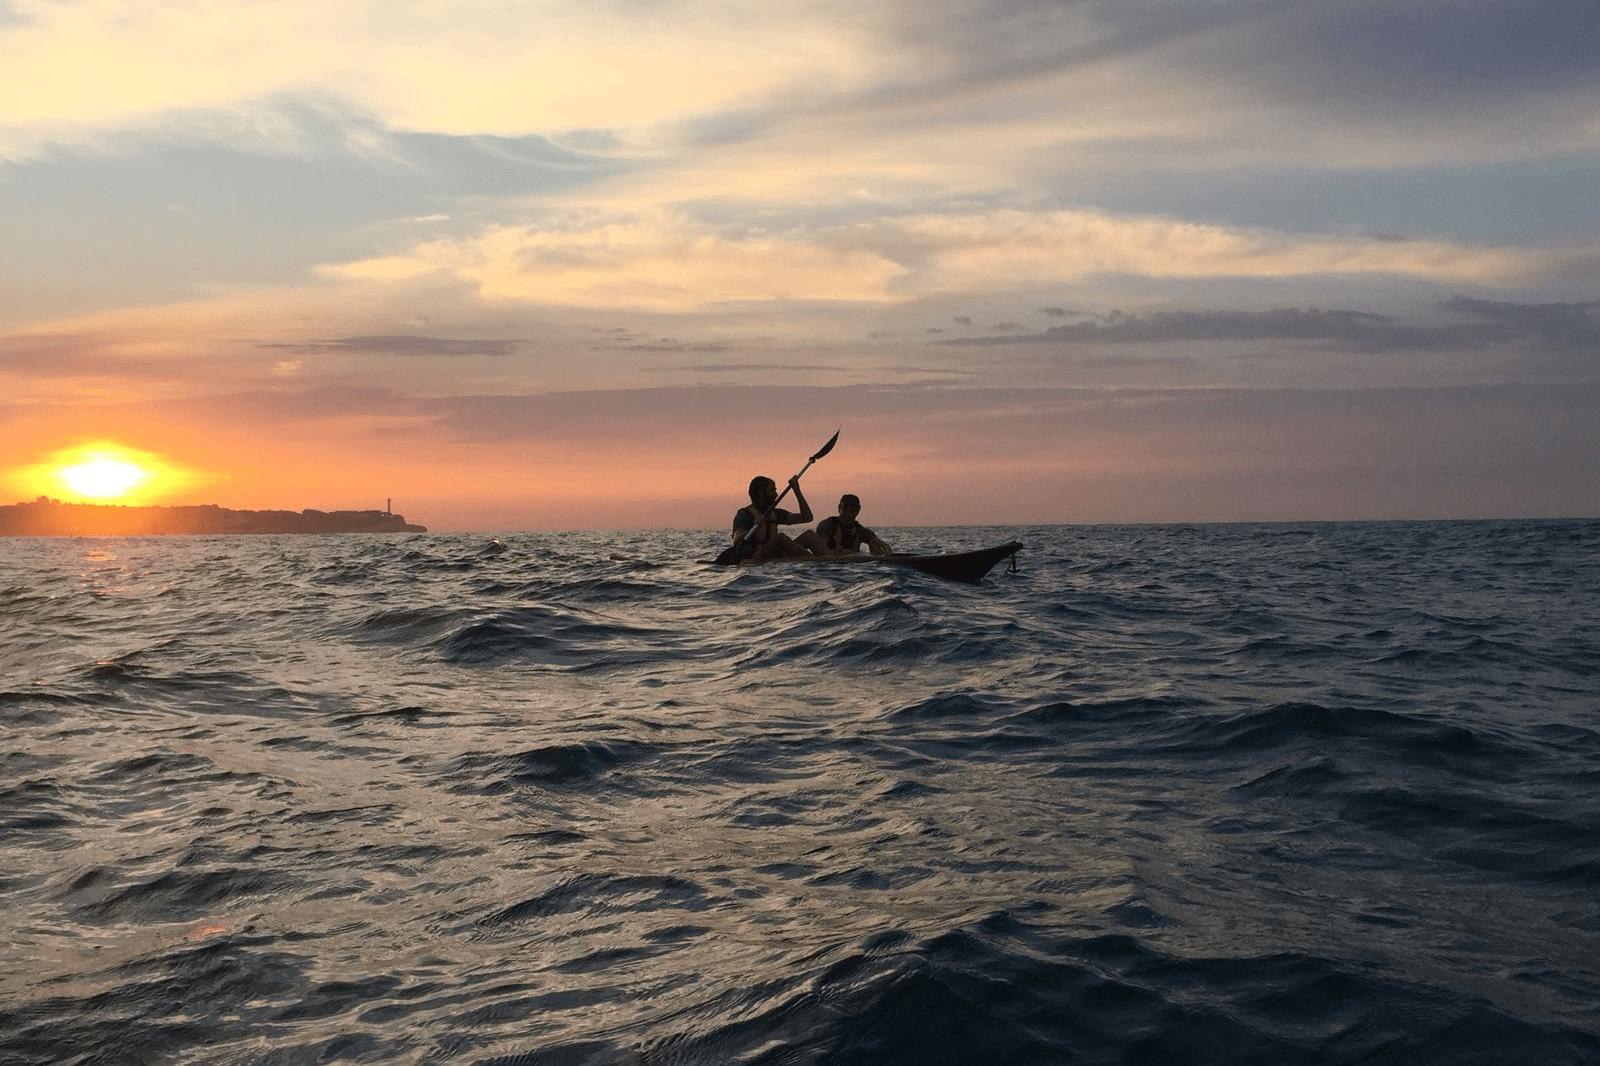 Esportec-mar-kayac